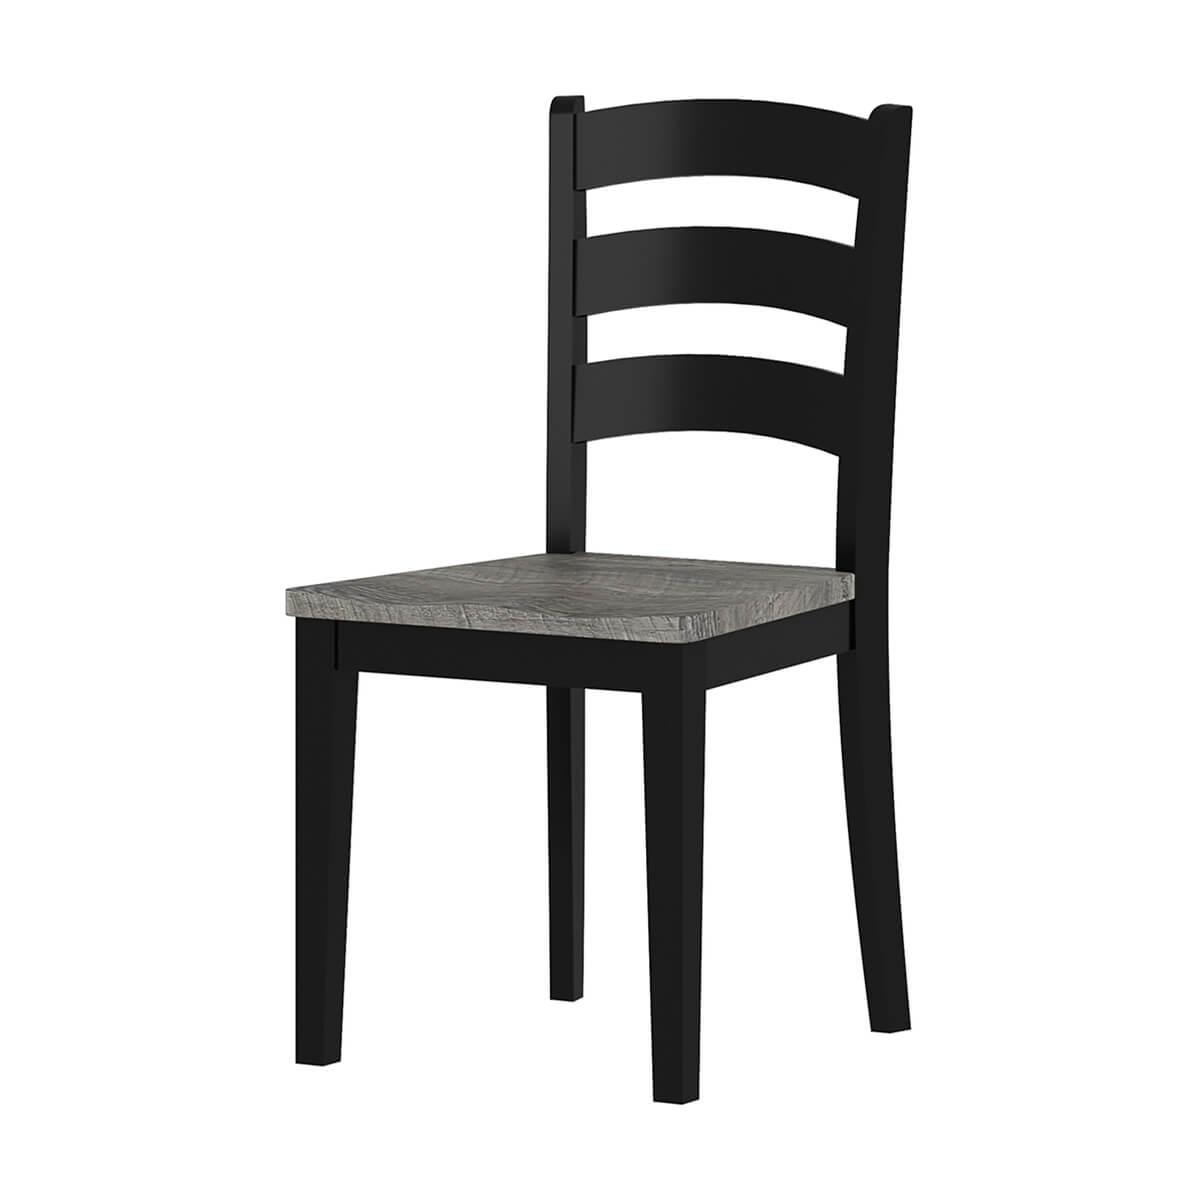 Moosonee Black Two Tone Solid Wood Farmhouse Ladder Back Dining Chair